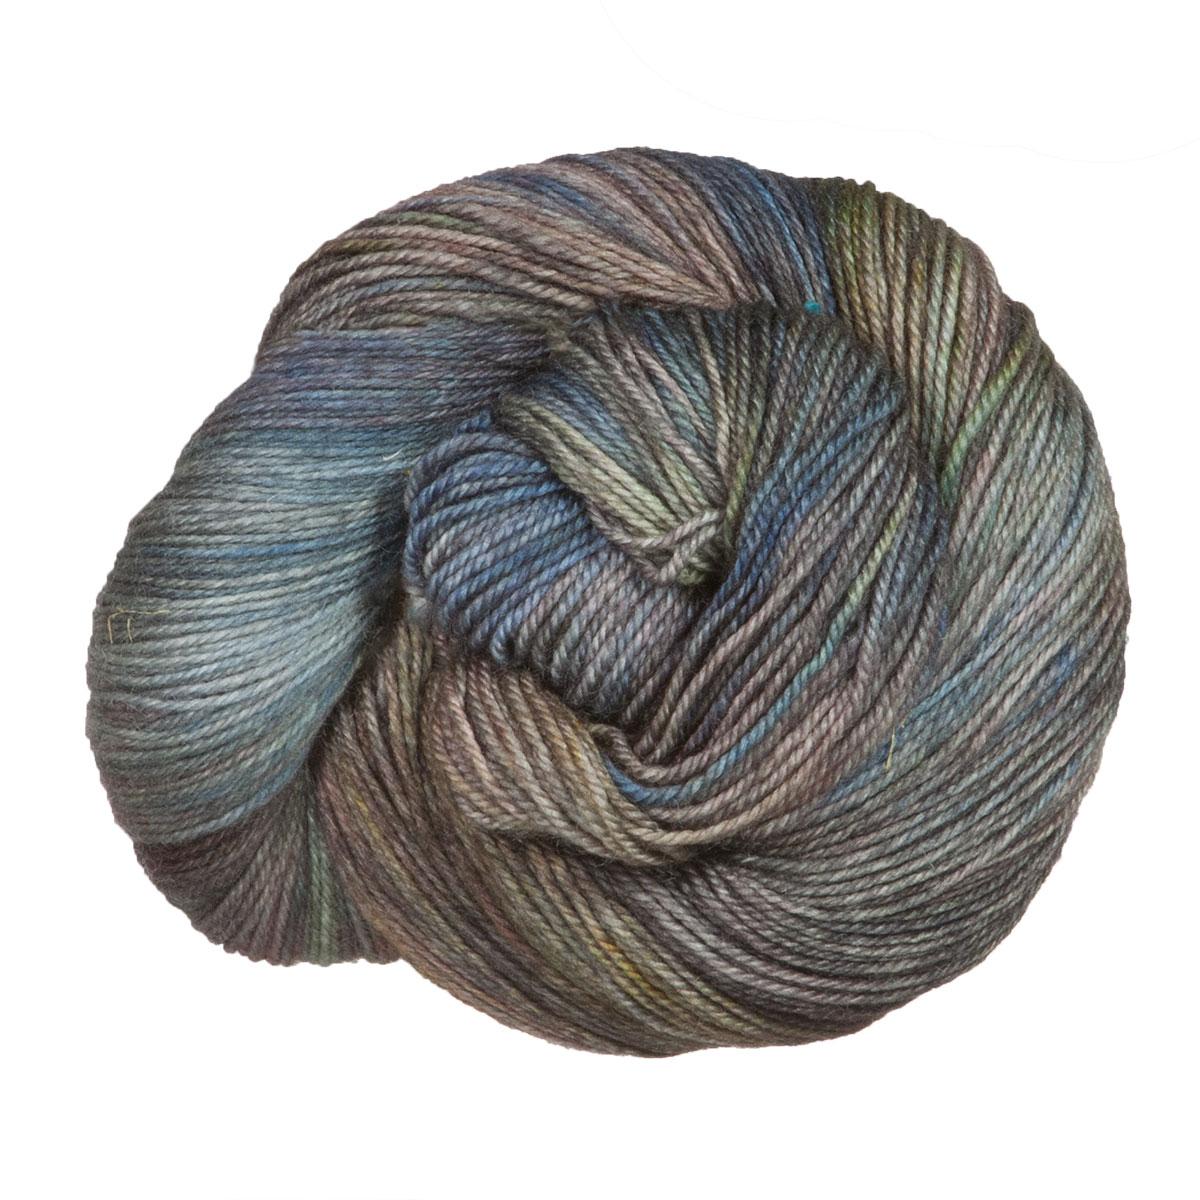 New Sock Yarn image #1 xtbqova